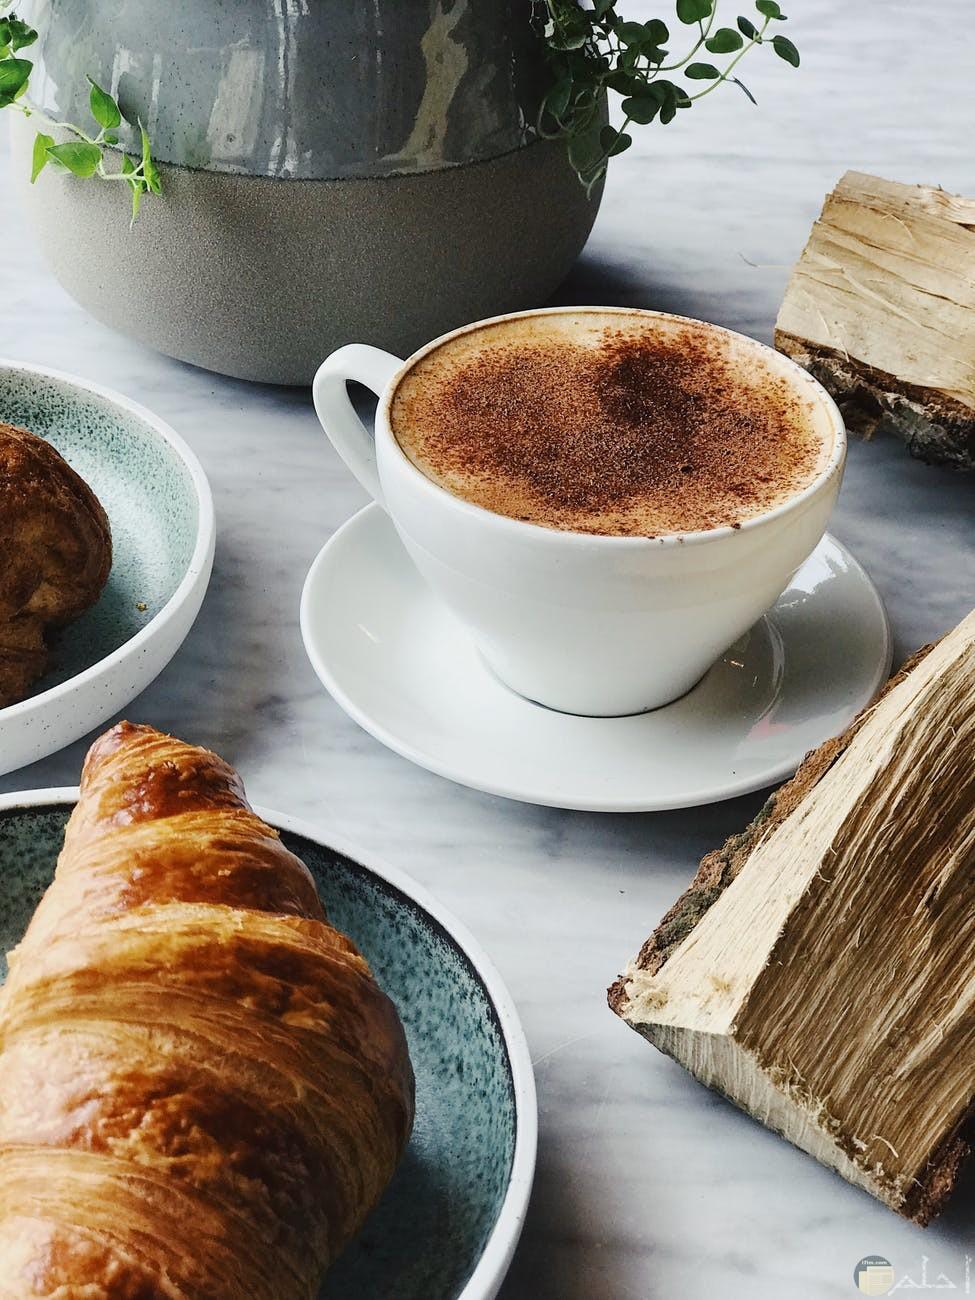 قطعة باتيه وكوب قهوه فطار رائع